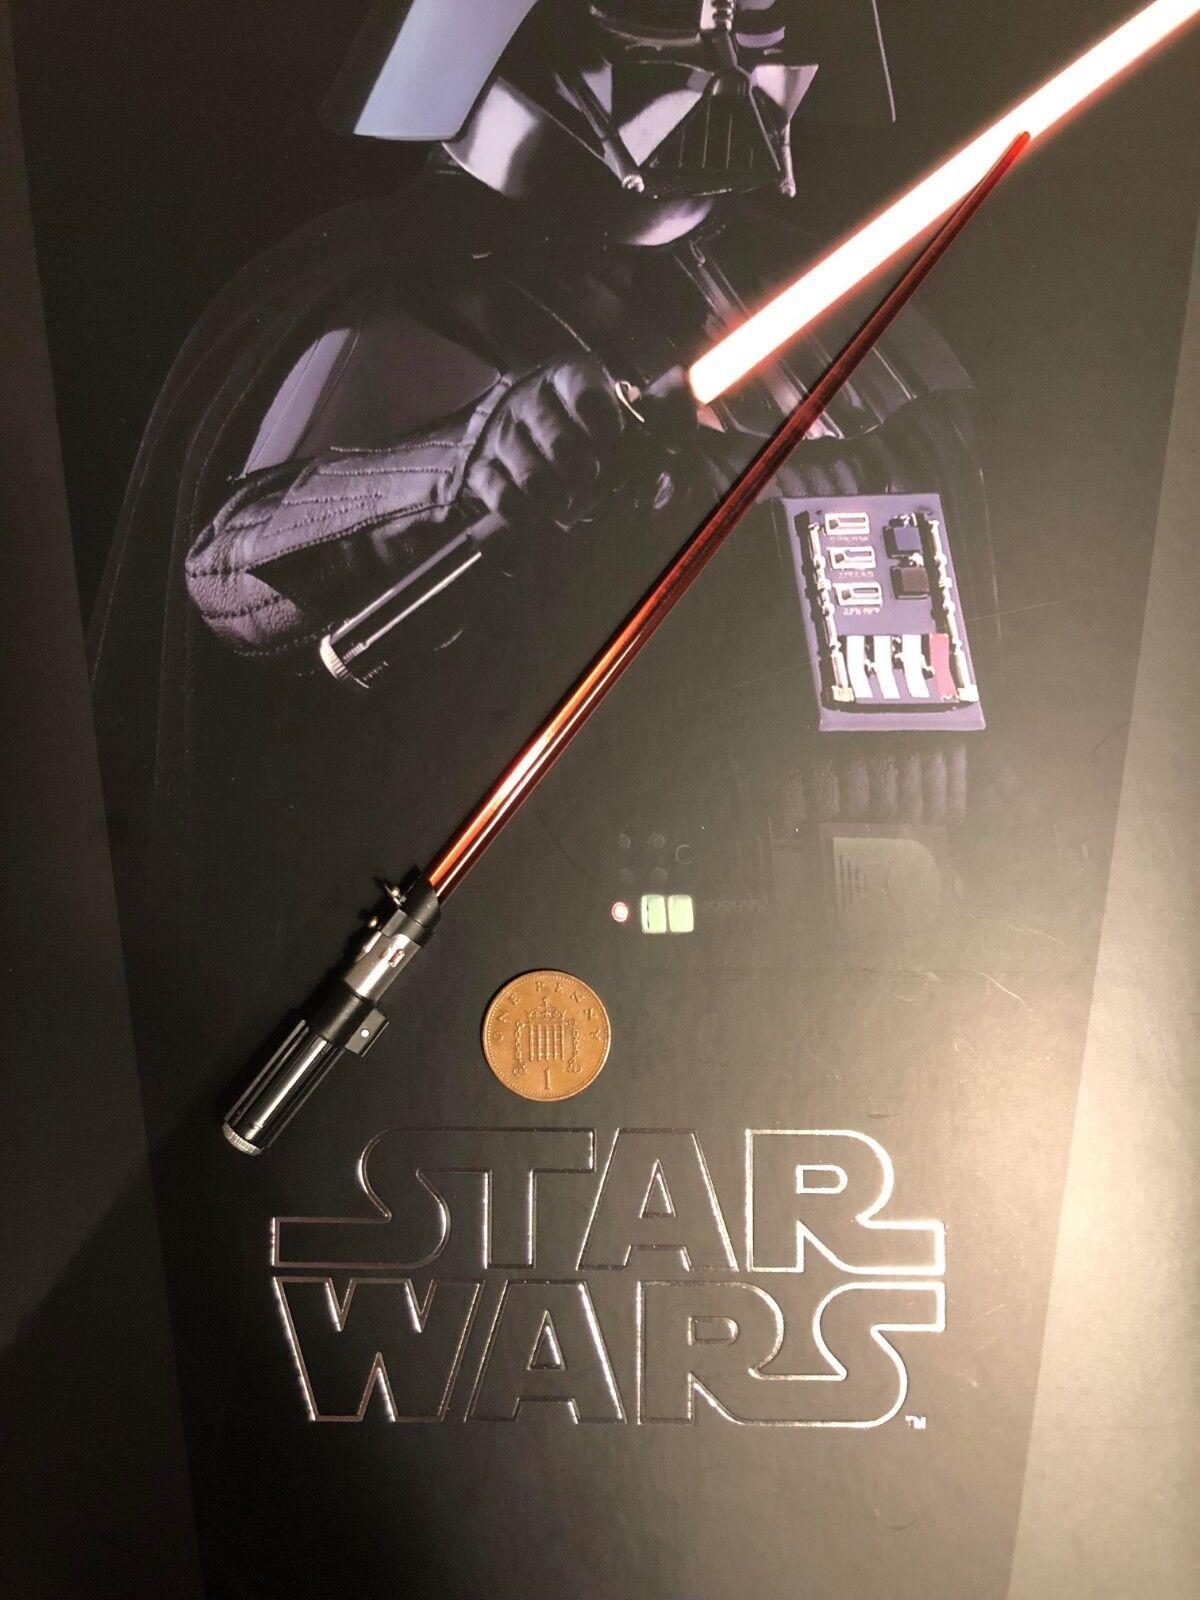 Hot Toys Star Wars ESB Darth Vader MMS452 Lightsaber loose 1 6th scale